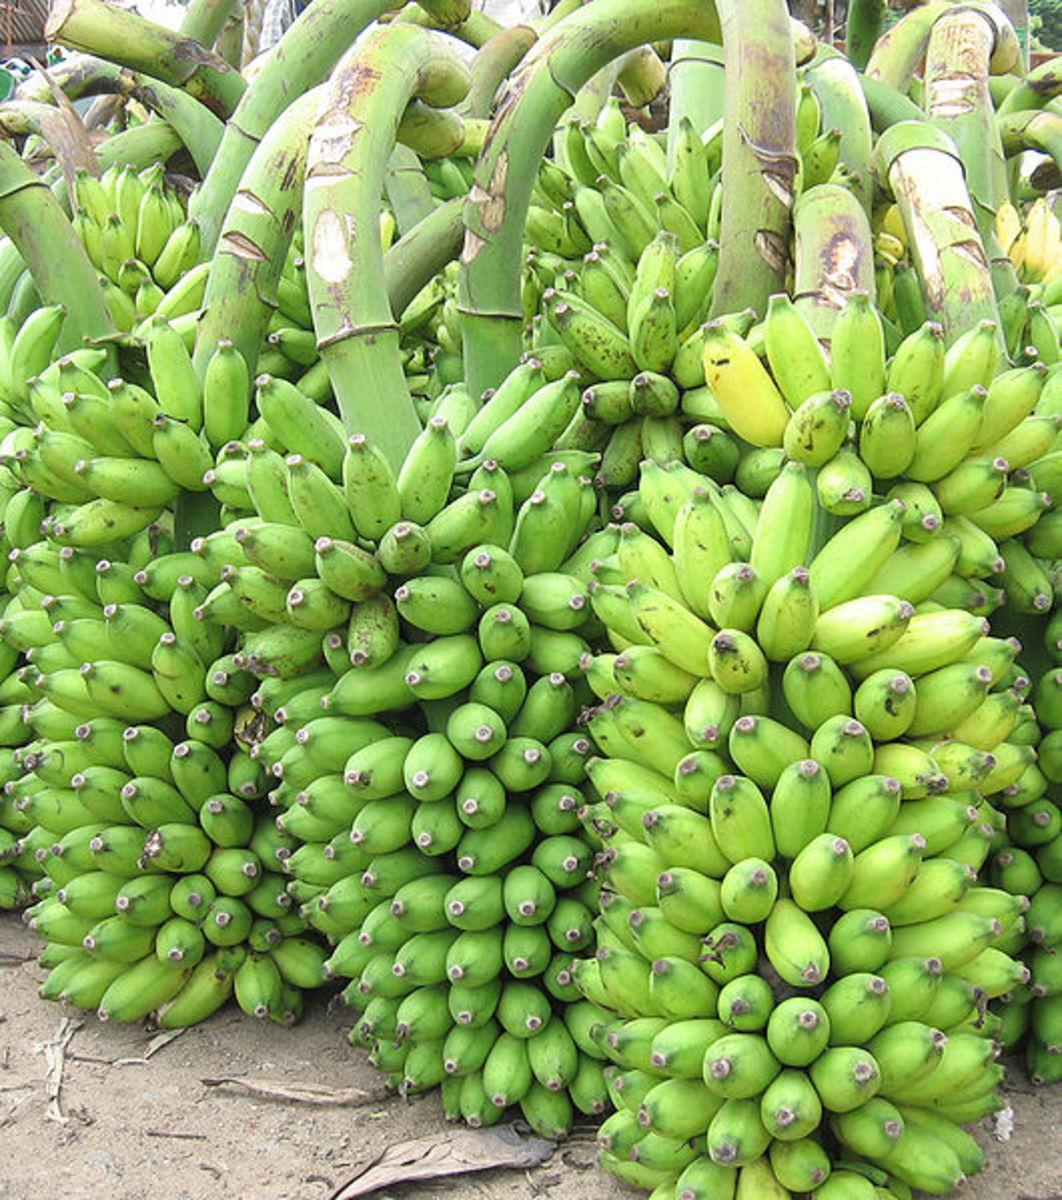 Green bananas, source: Wikipedia